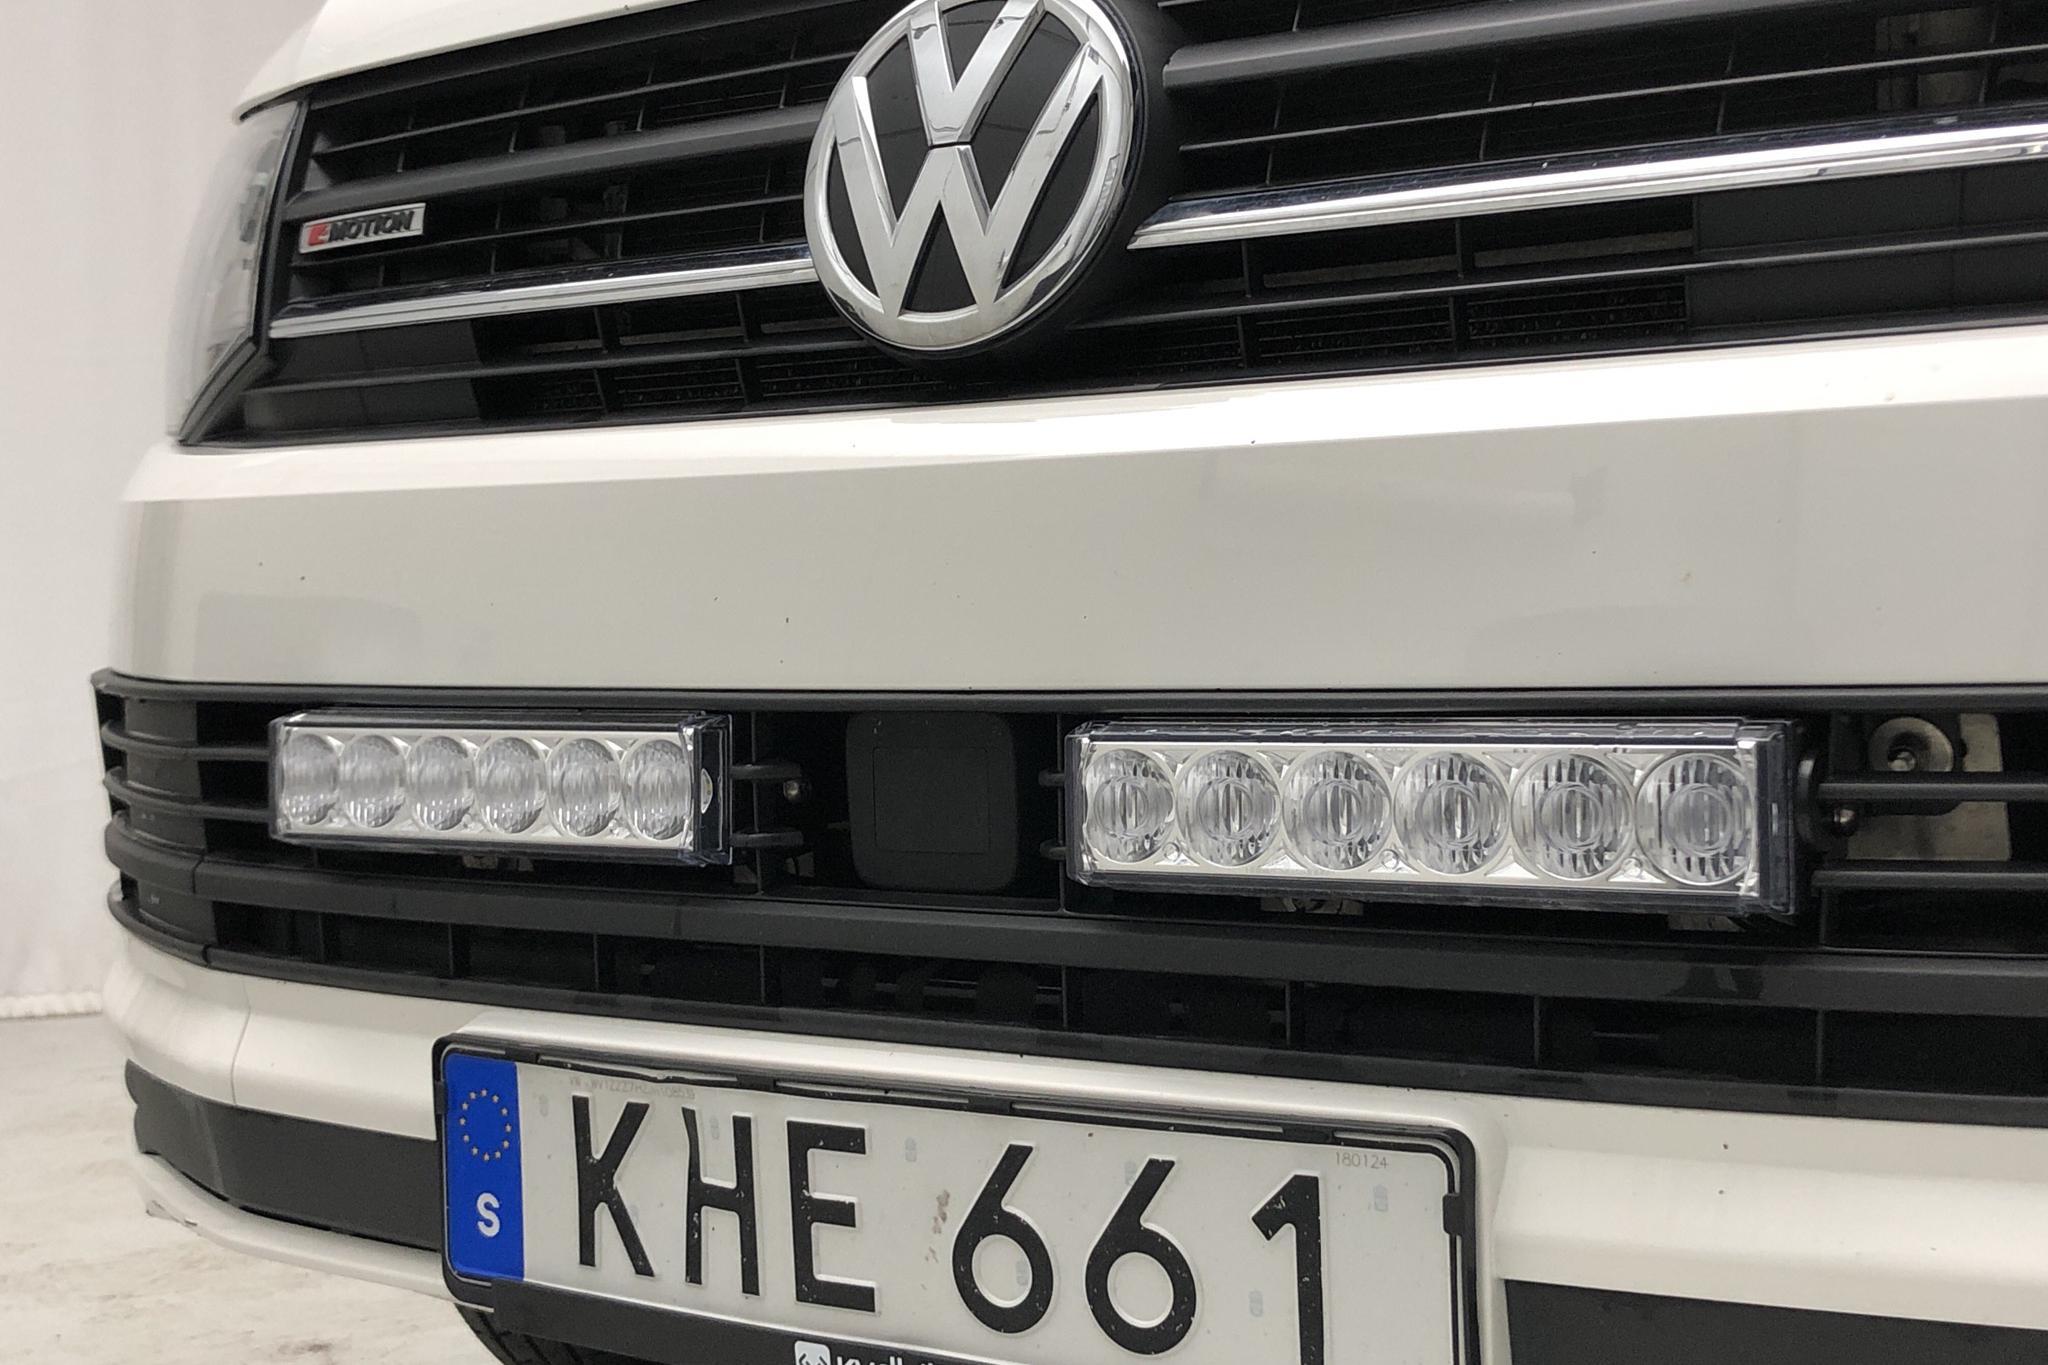 VW Transporter T6 2.0 TDI BMT Skåp 4MOTION (150hk) - 0 km - Automatic - white - 2018